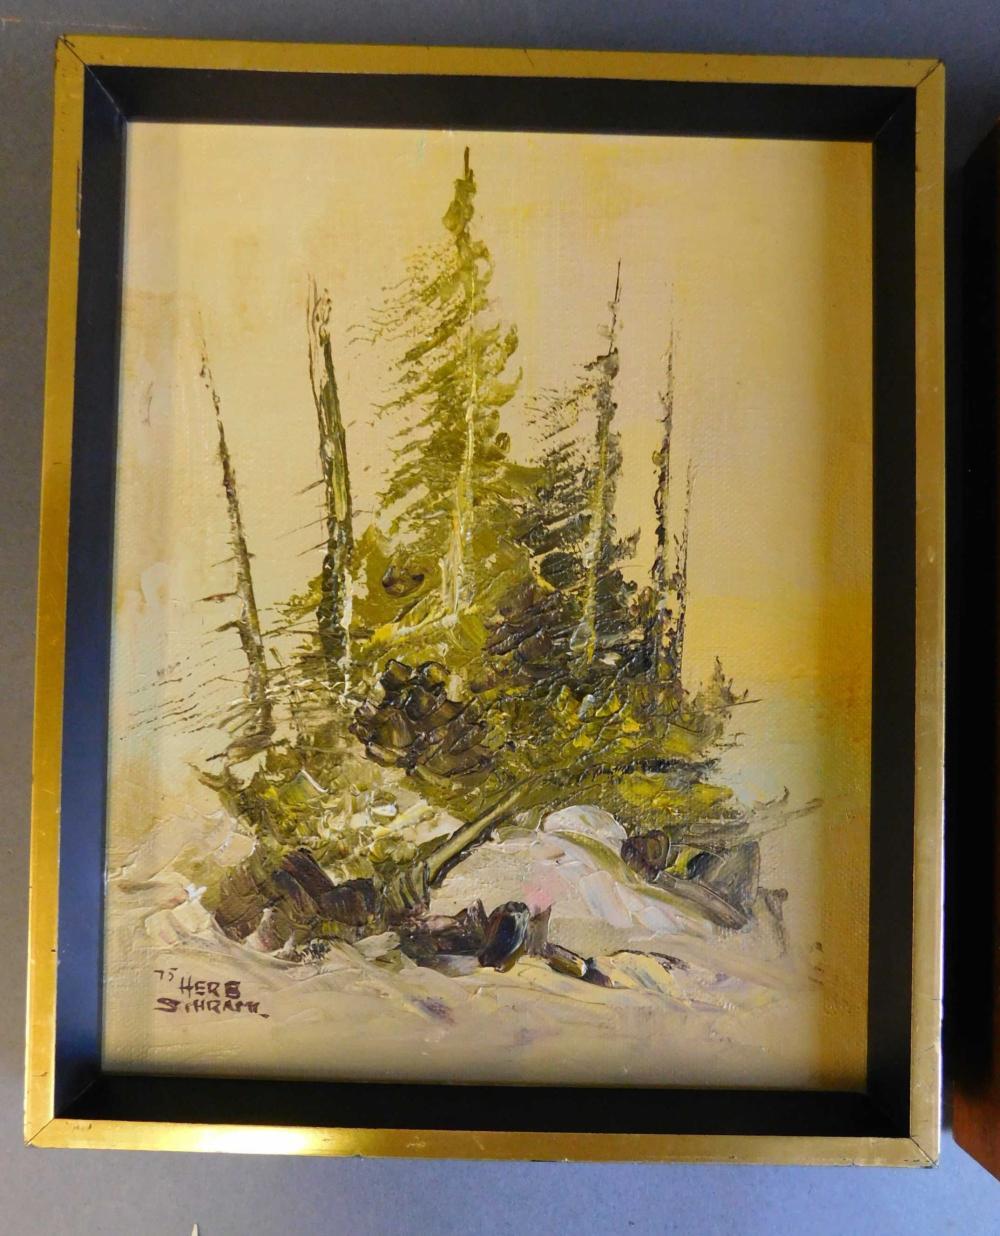 Herb Schraml. 3 signed oil paintings. Framed.